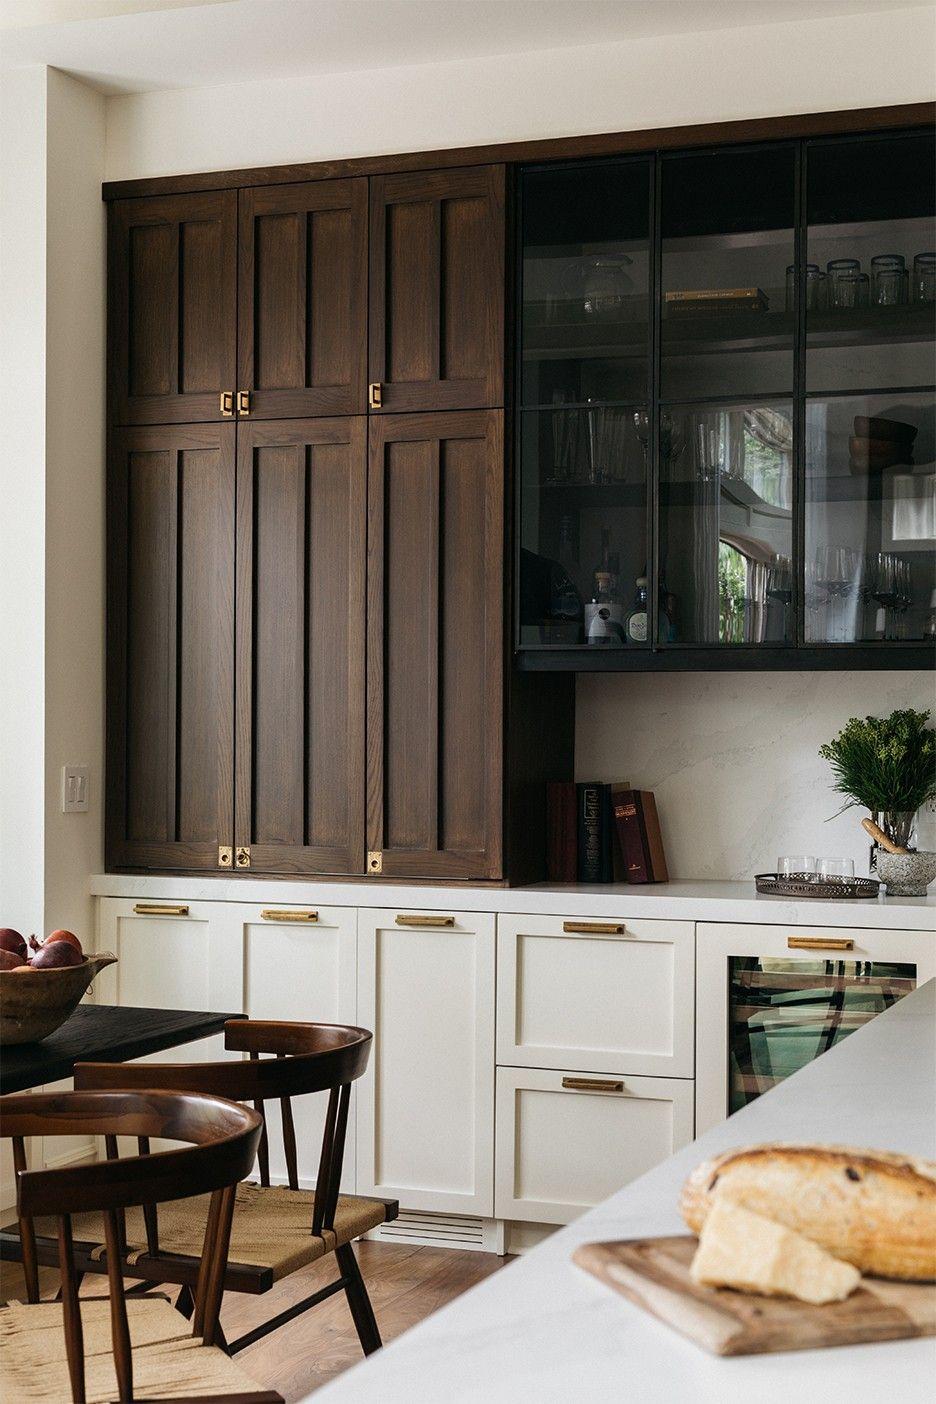 DIY Dream Catchers to Decor Your Bedroom